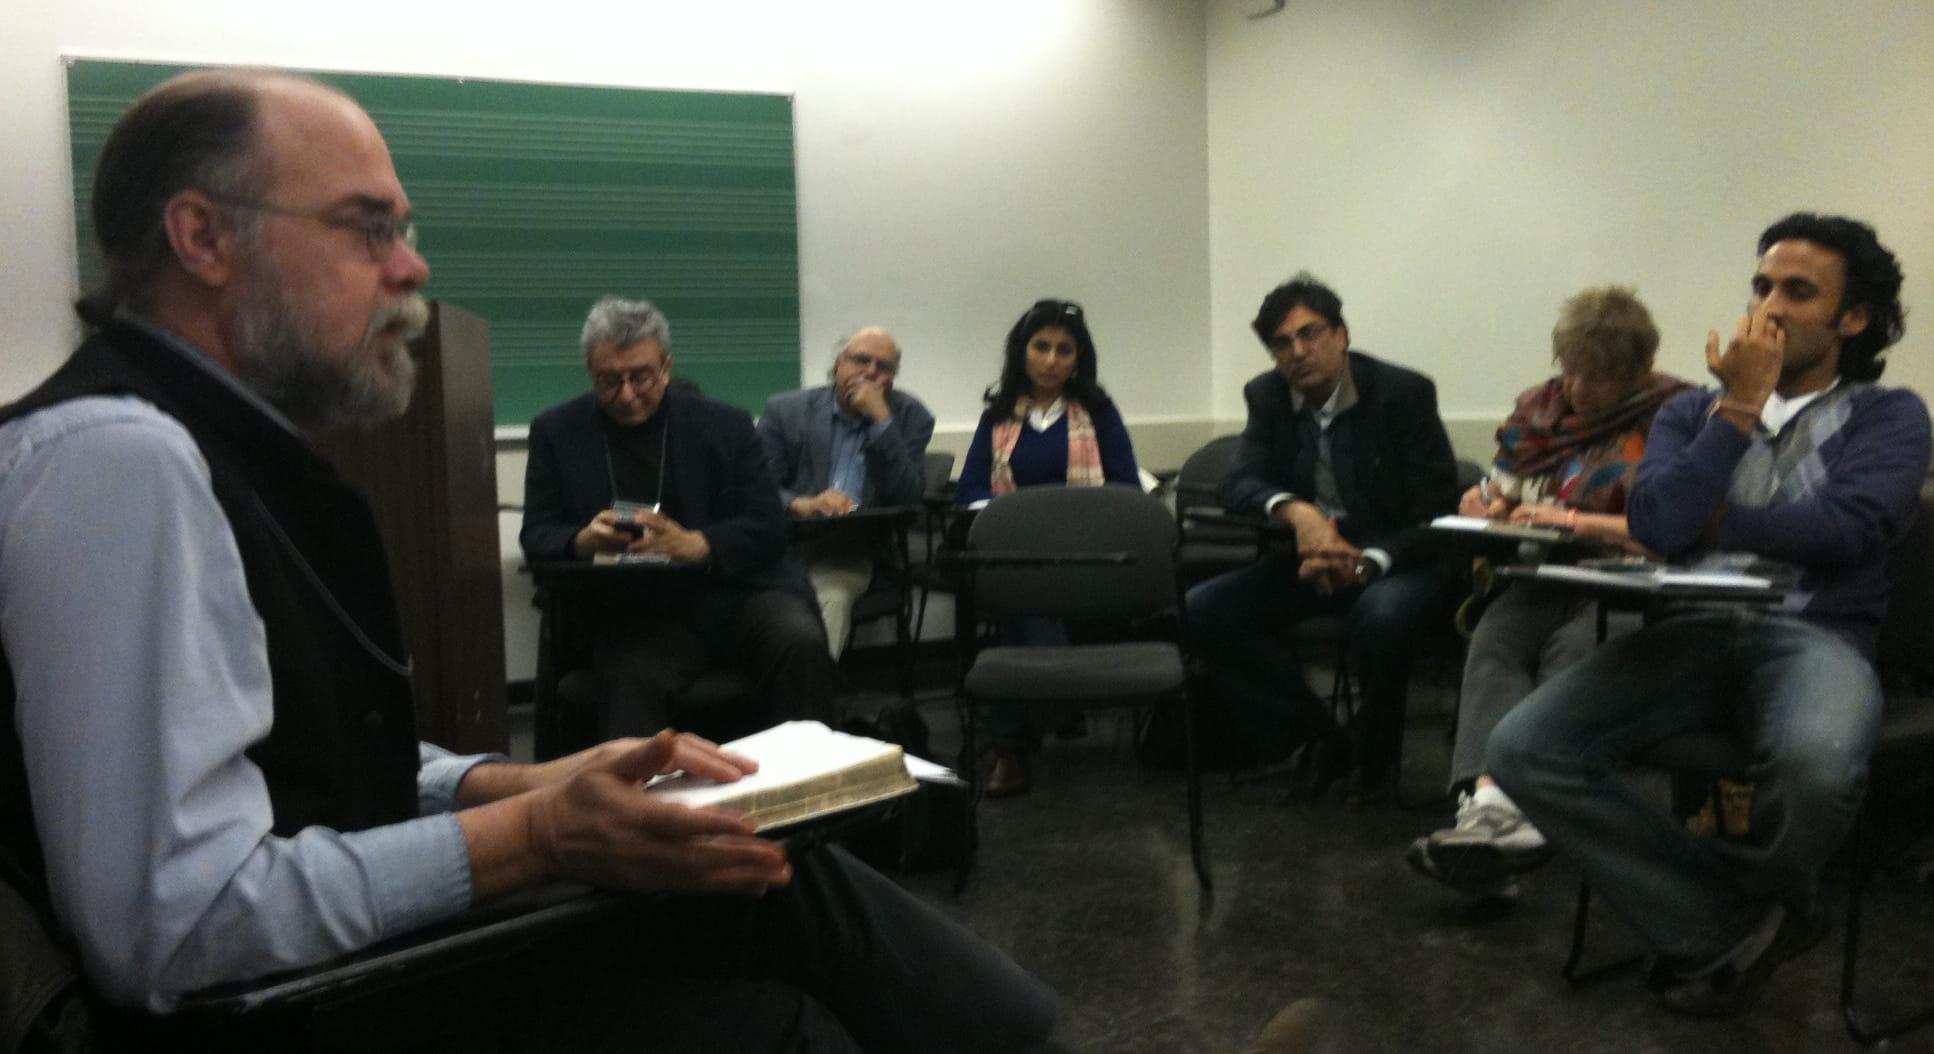 Andy Mc Cord responding to a quetion at the Faiz panel. Photo: Beena Sarwar